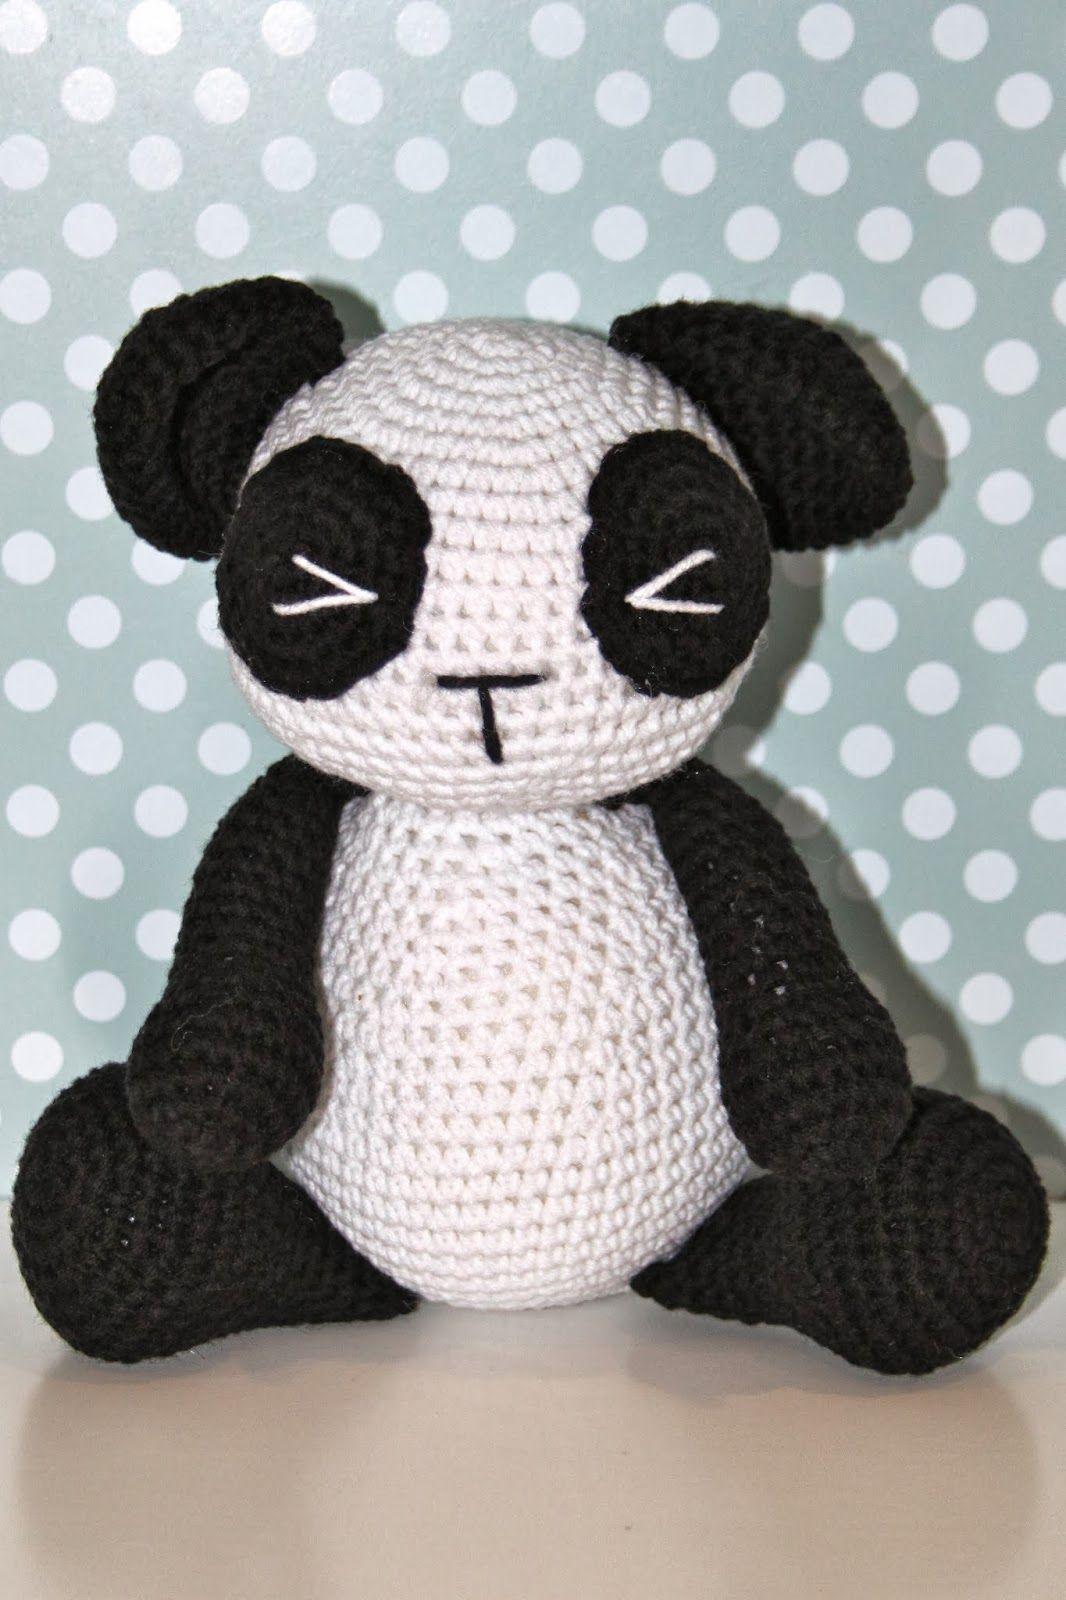 Guiños de lana: Es el panda, es el panda.... | mandar | Pinterest ...